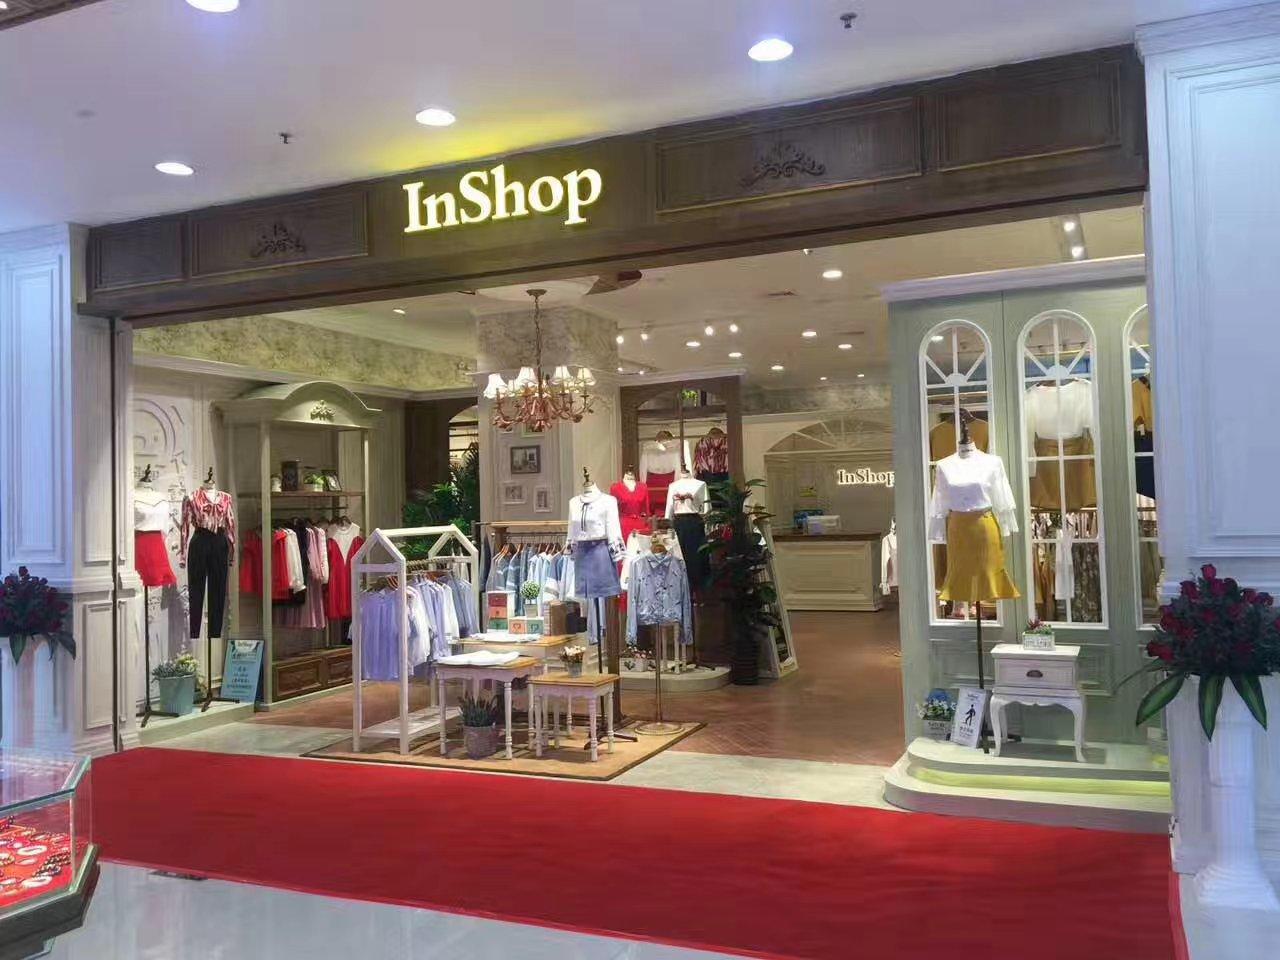 InShop